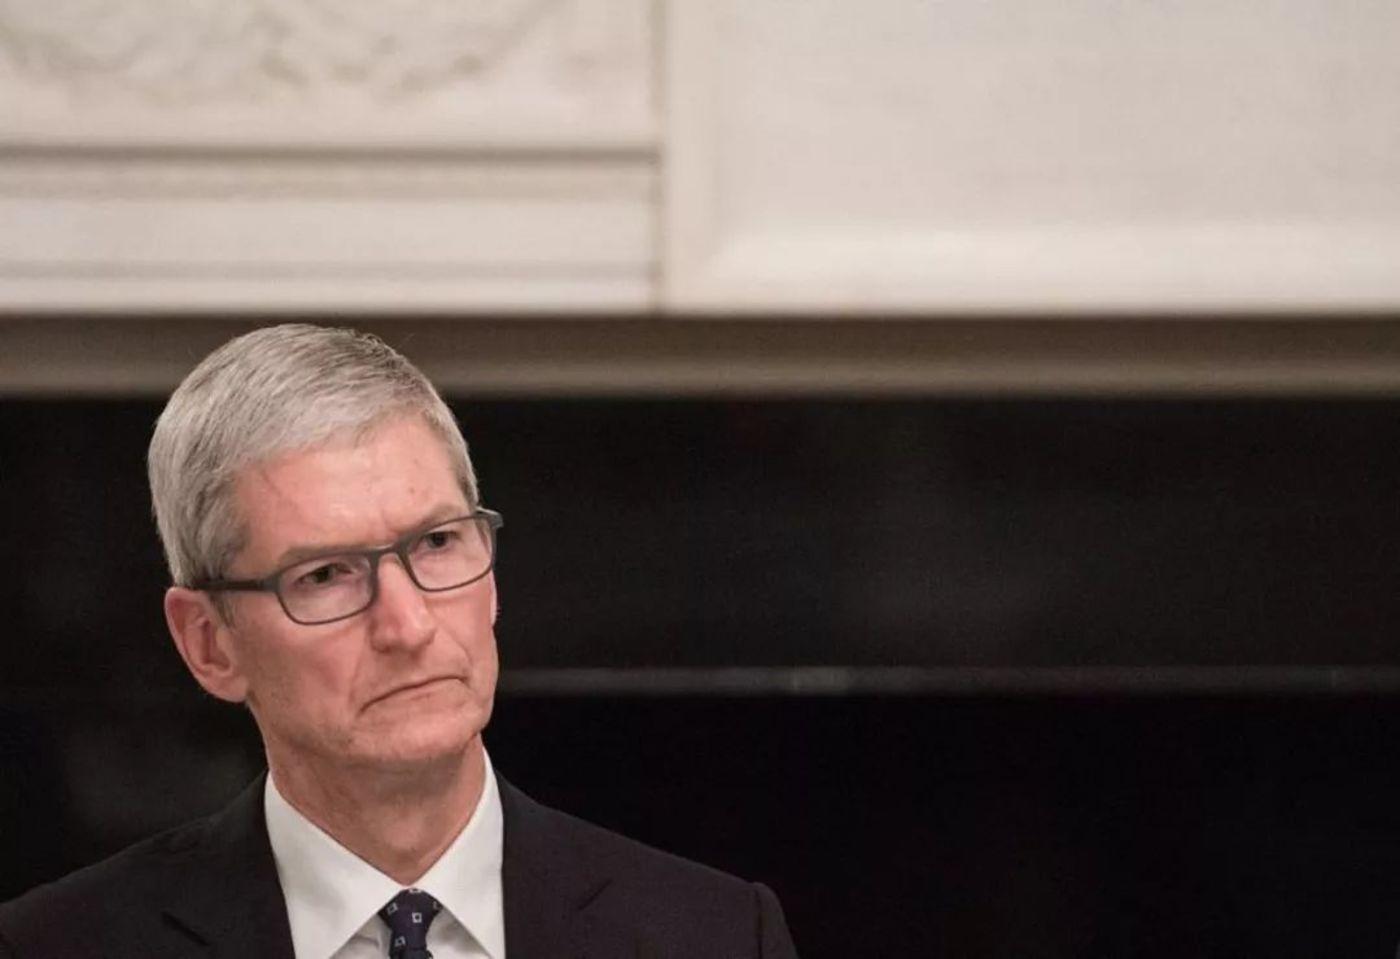 App Store 被指垄断让苹果一夜没了580亿美元。现在天苹果曝光出的一项新技术,又是喜挑炎搜。